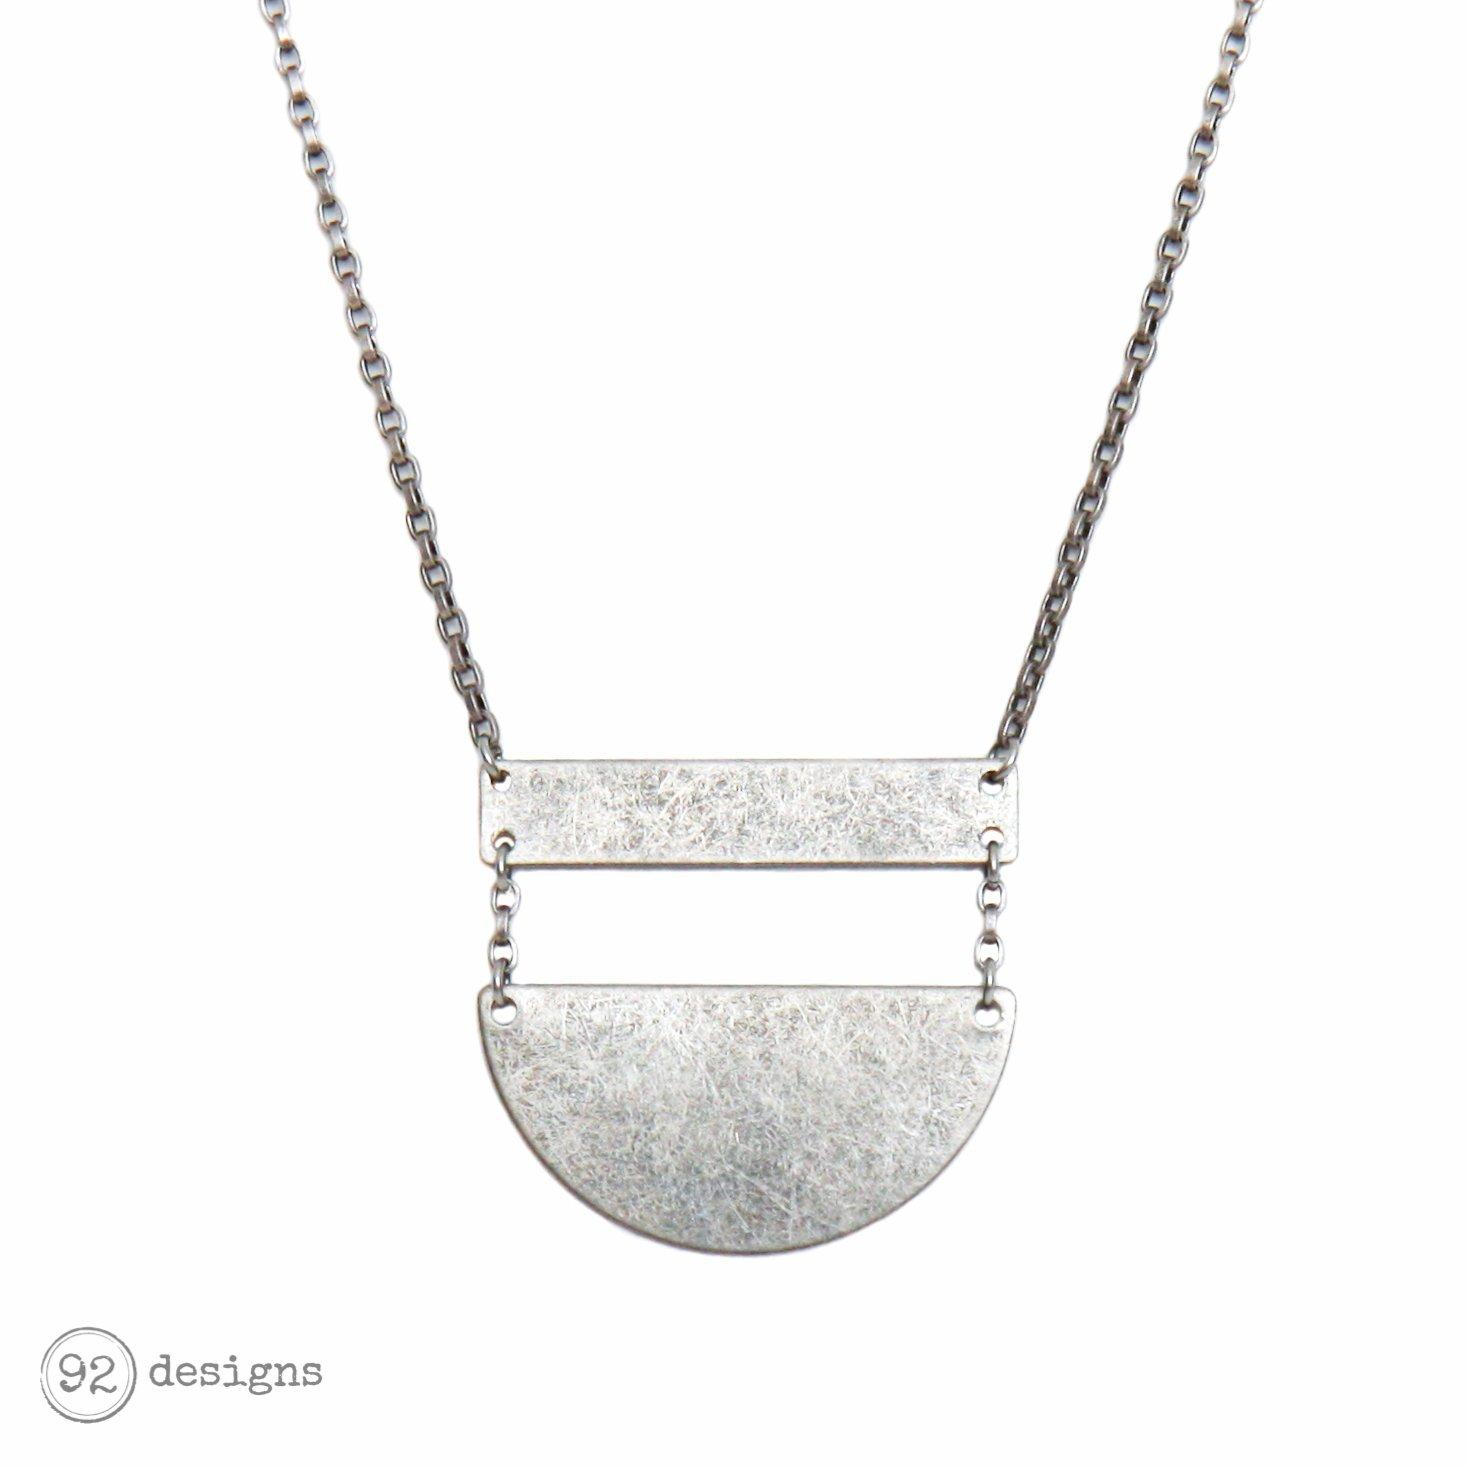 Negative Space Necklace